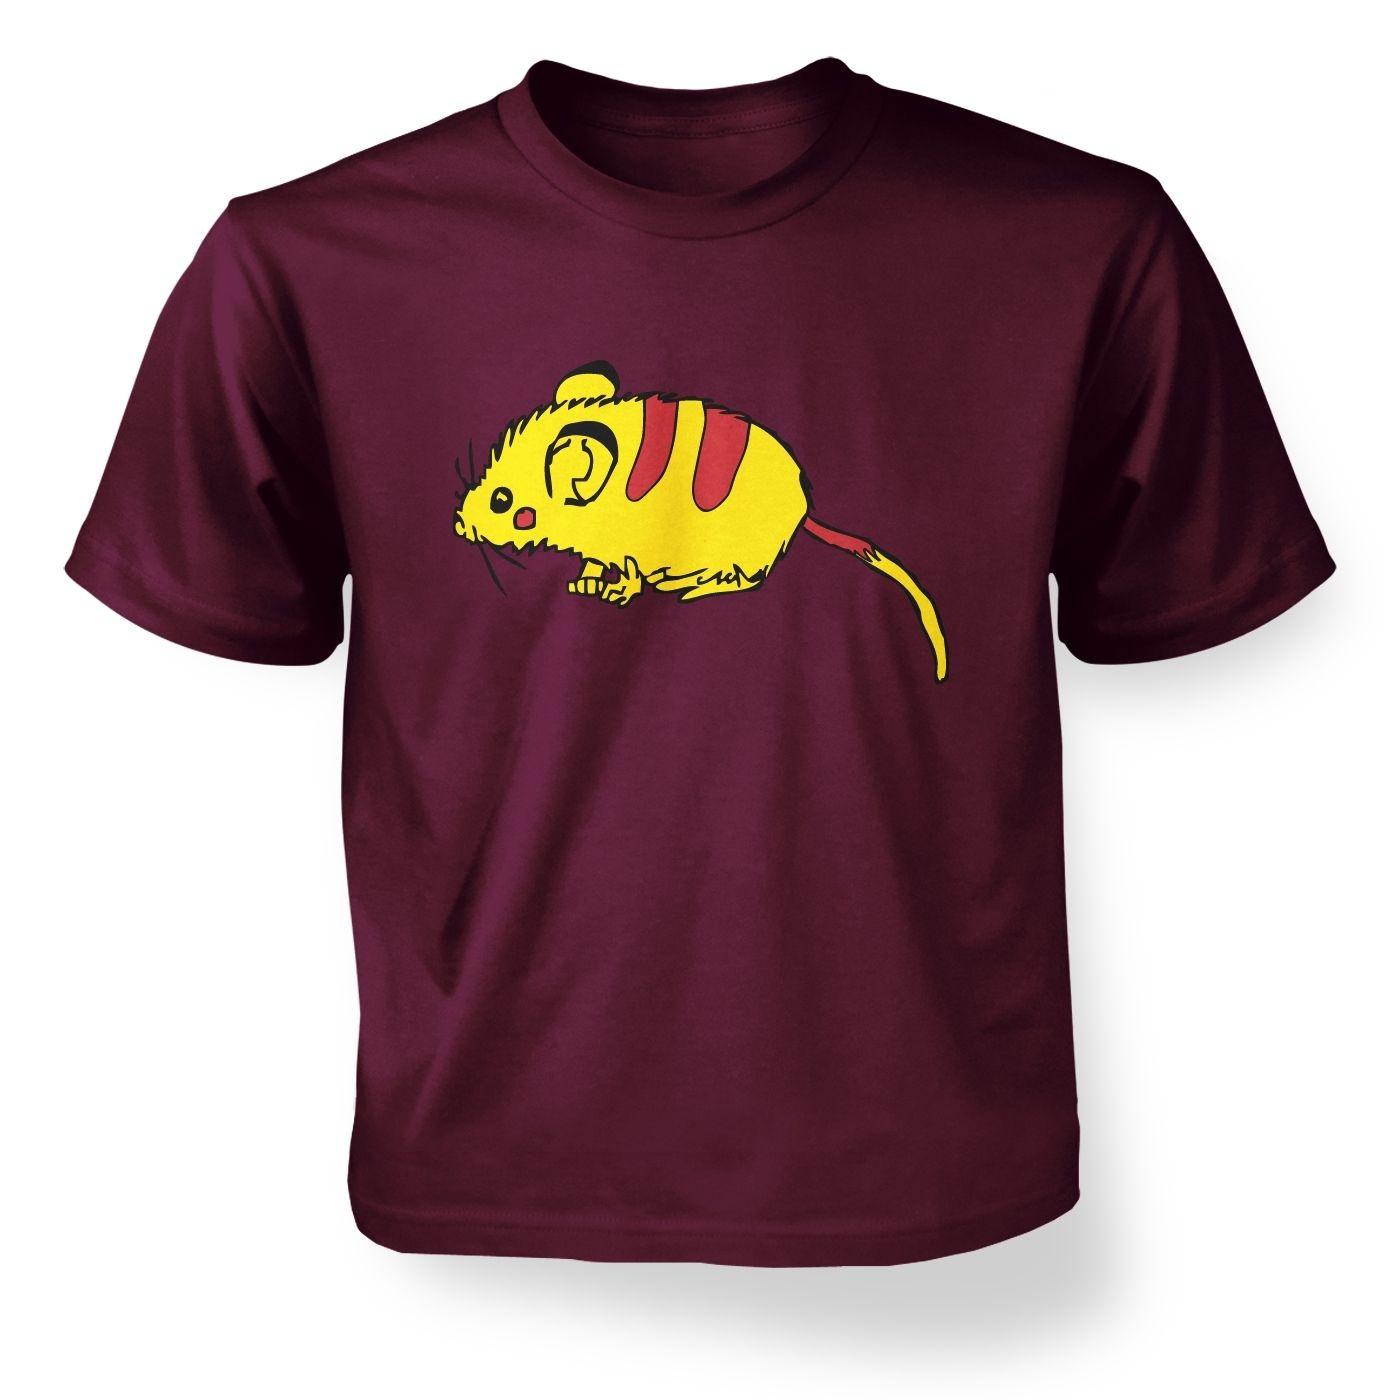 Kids' Real Life Pikachu T-Shirt - Inspired by Pokemon